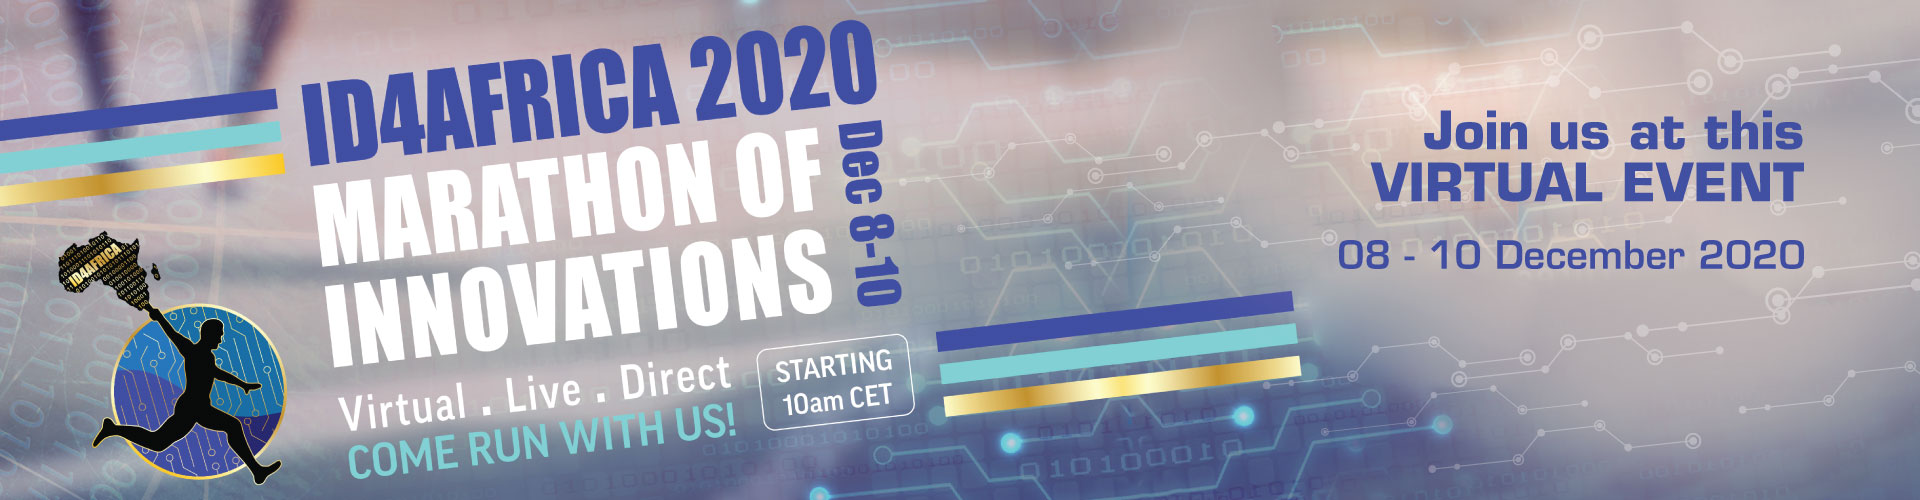 ID4AFRICA - Marathon of Innovation 2020